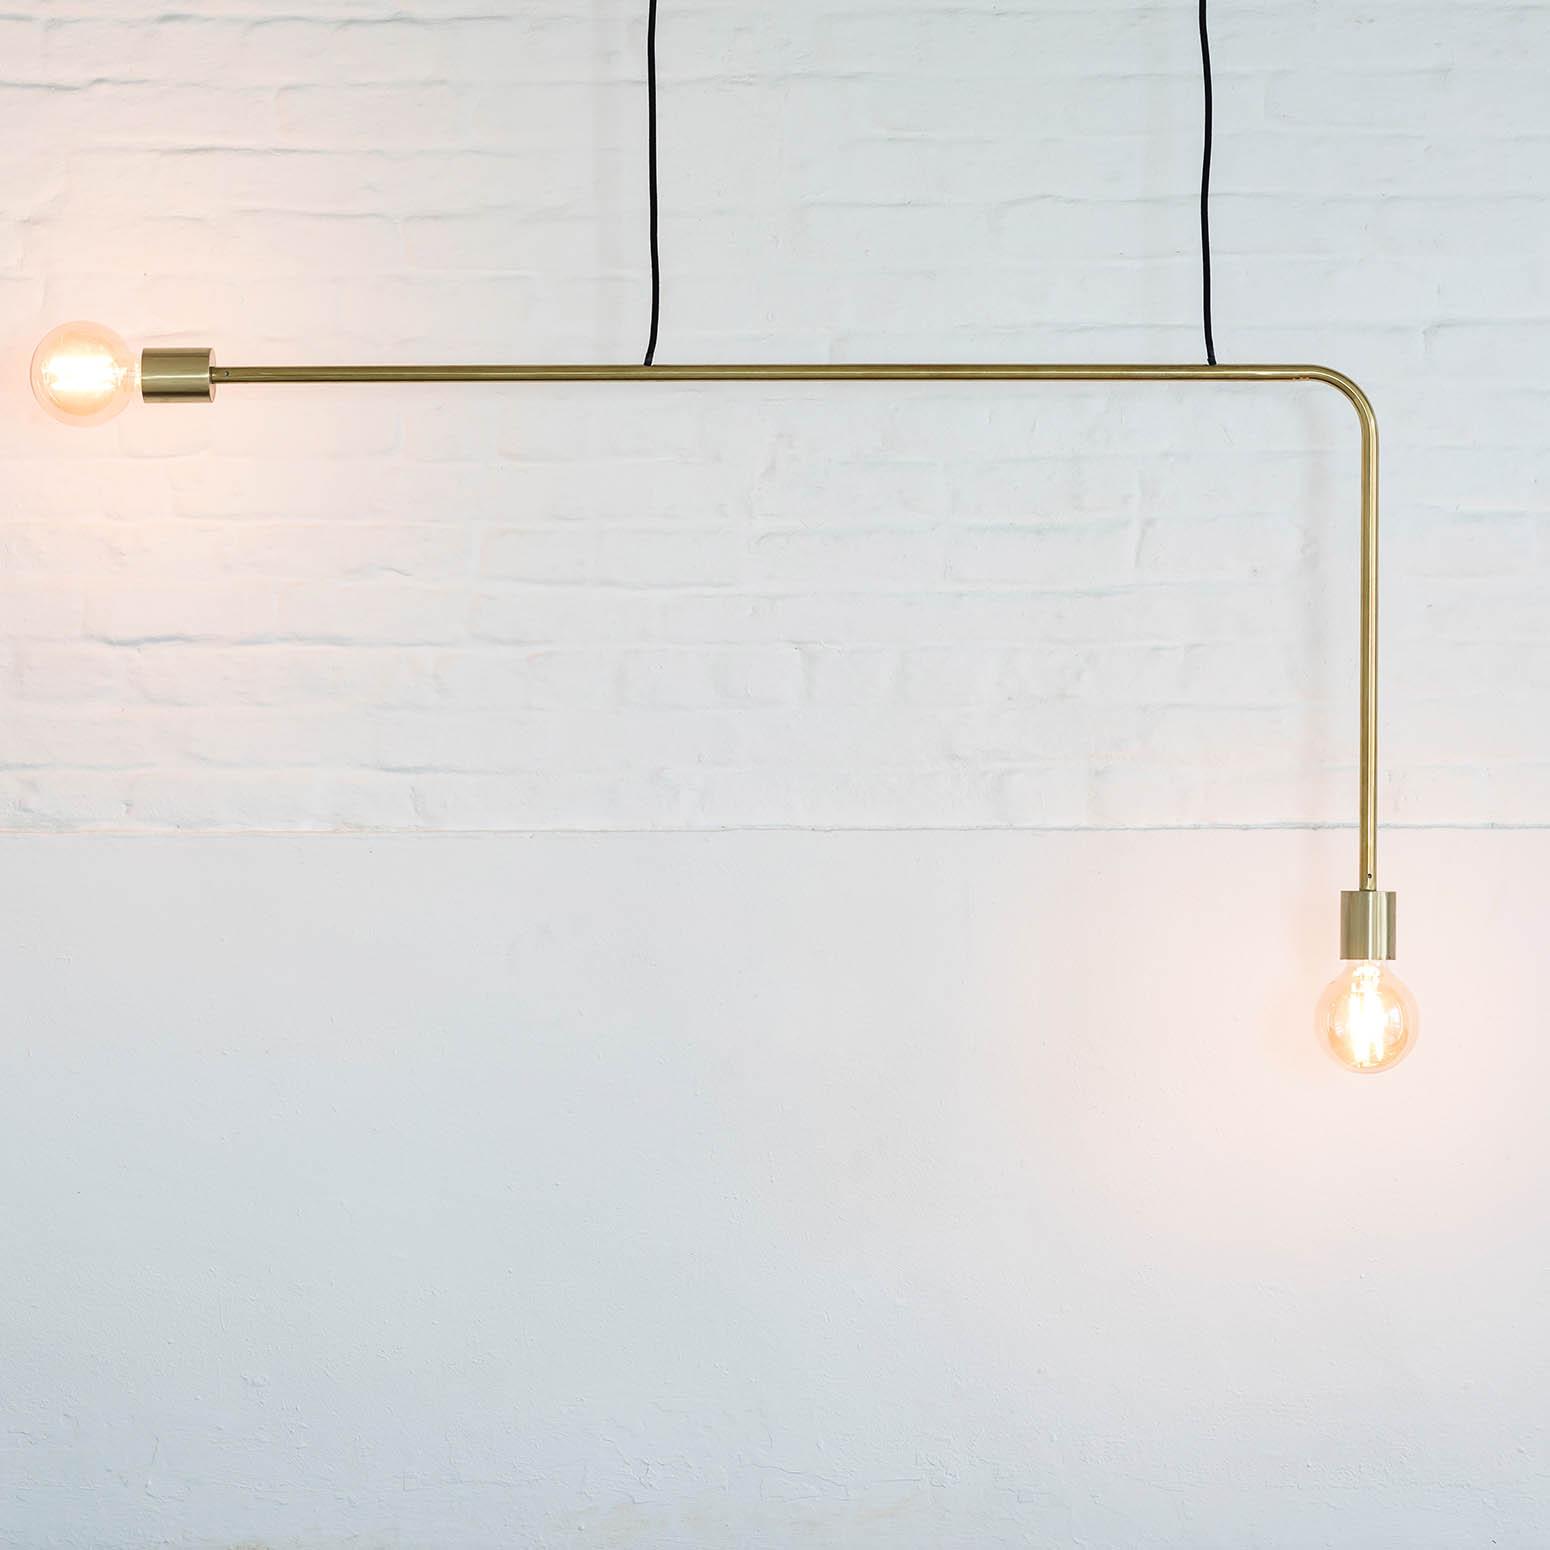 lampe-suspendue-KVG18-03-laiton-serax